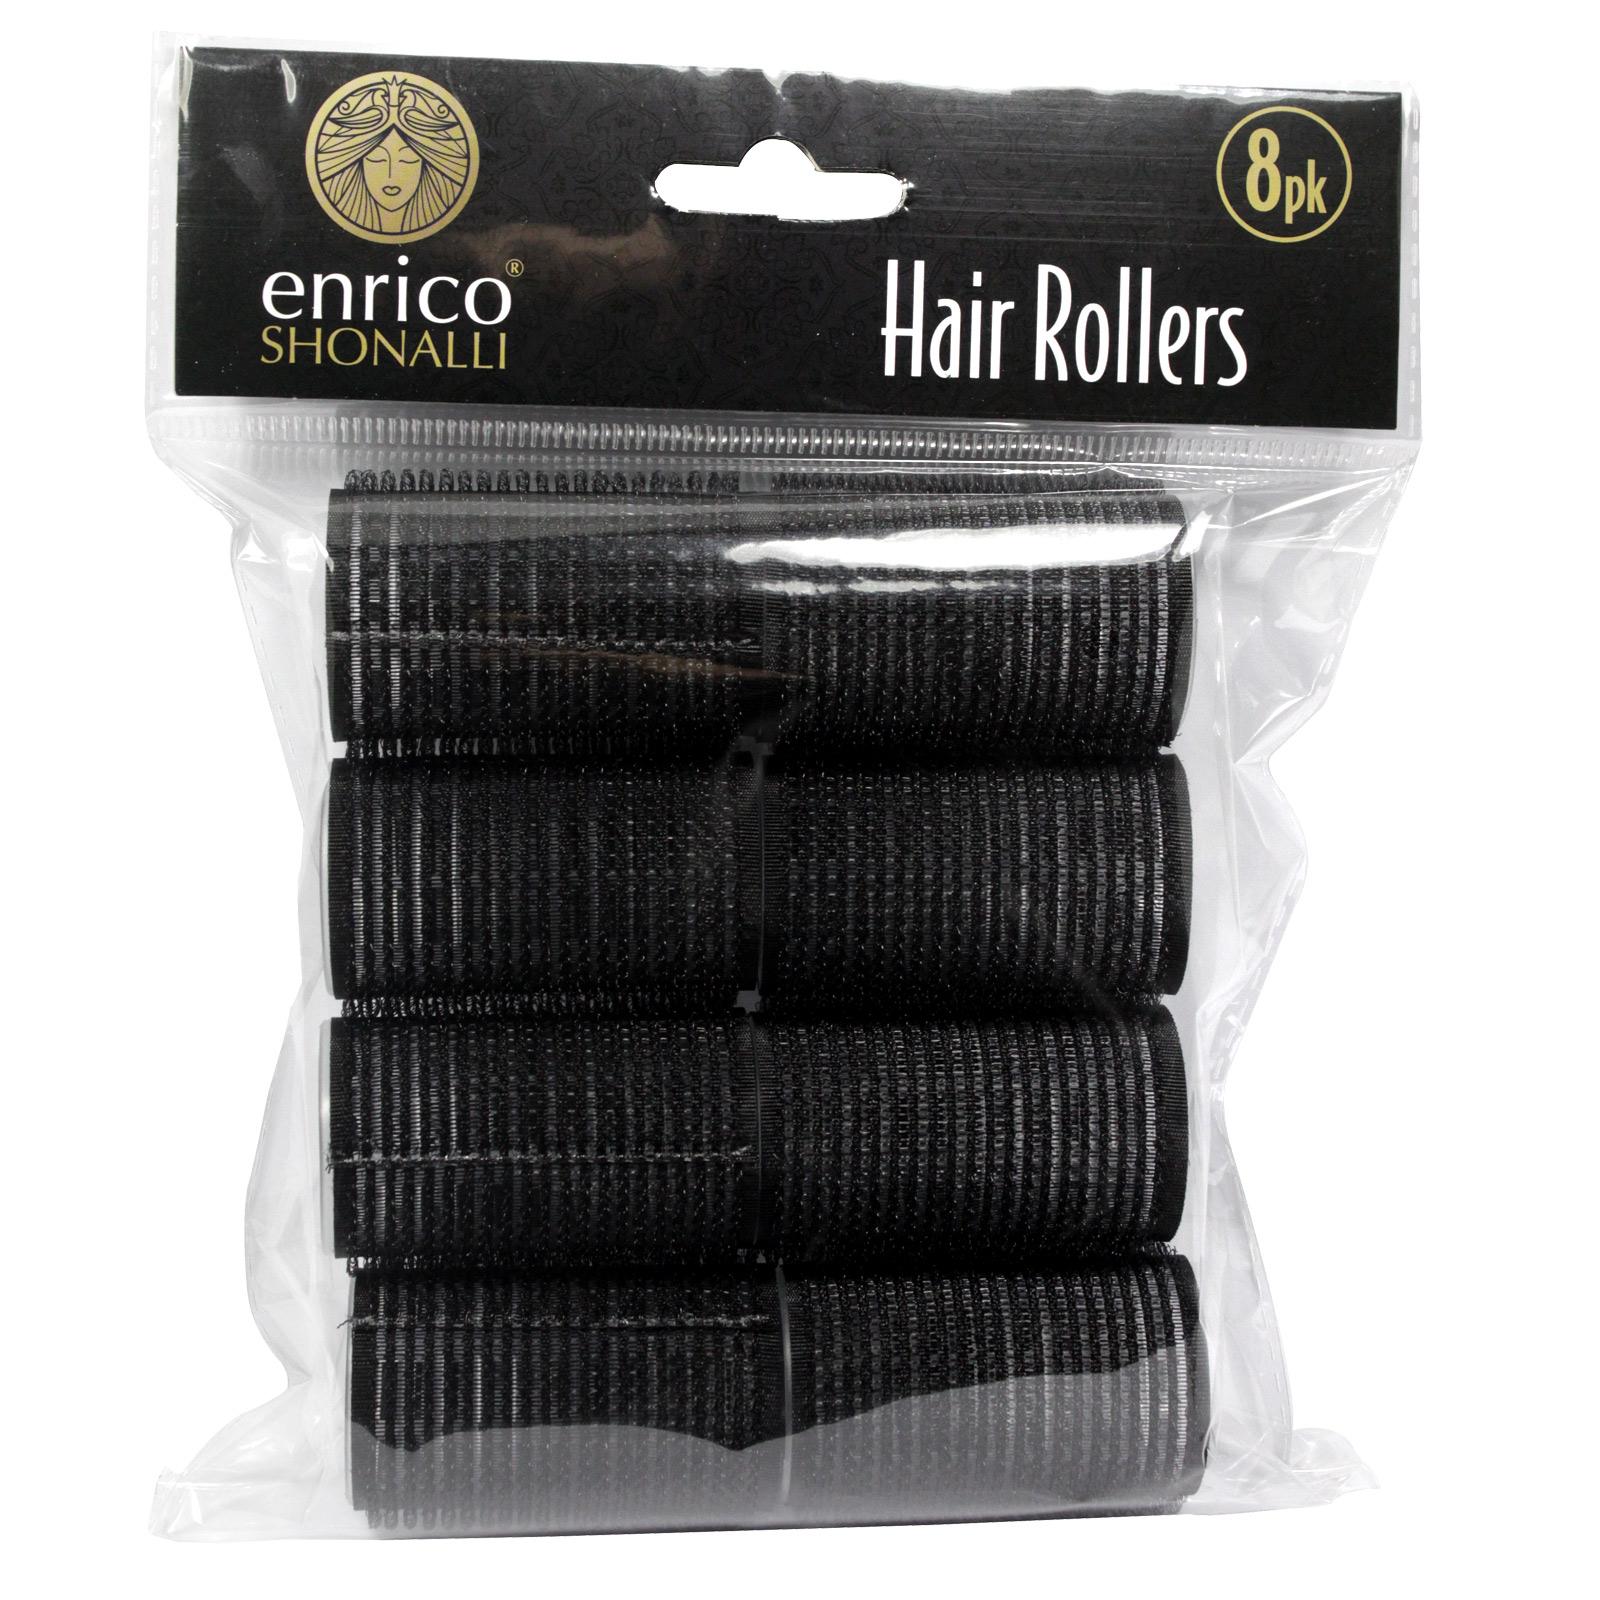 ENRICO HAIR ROLLERS VELCRO MEDIUM 8PK